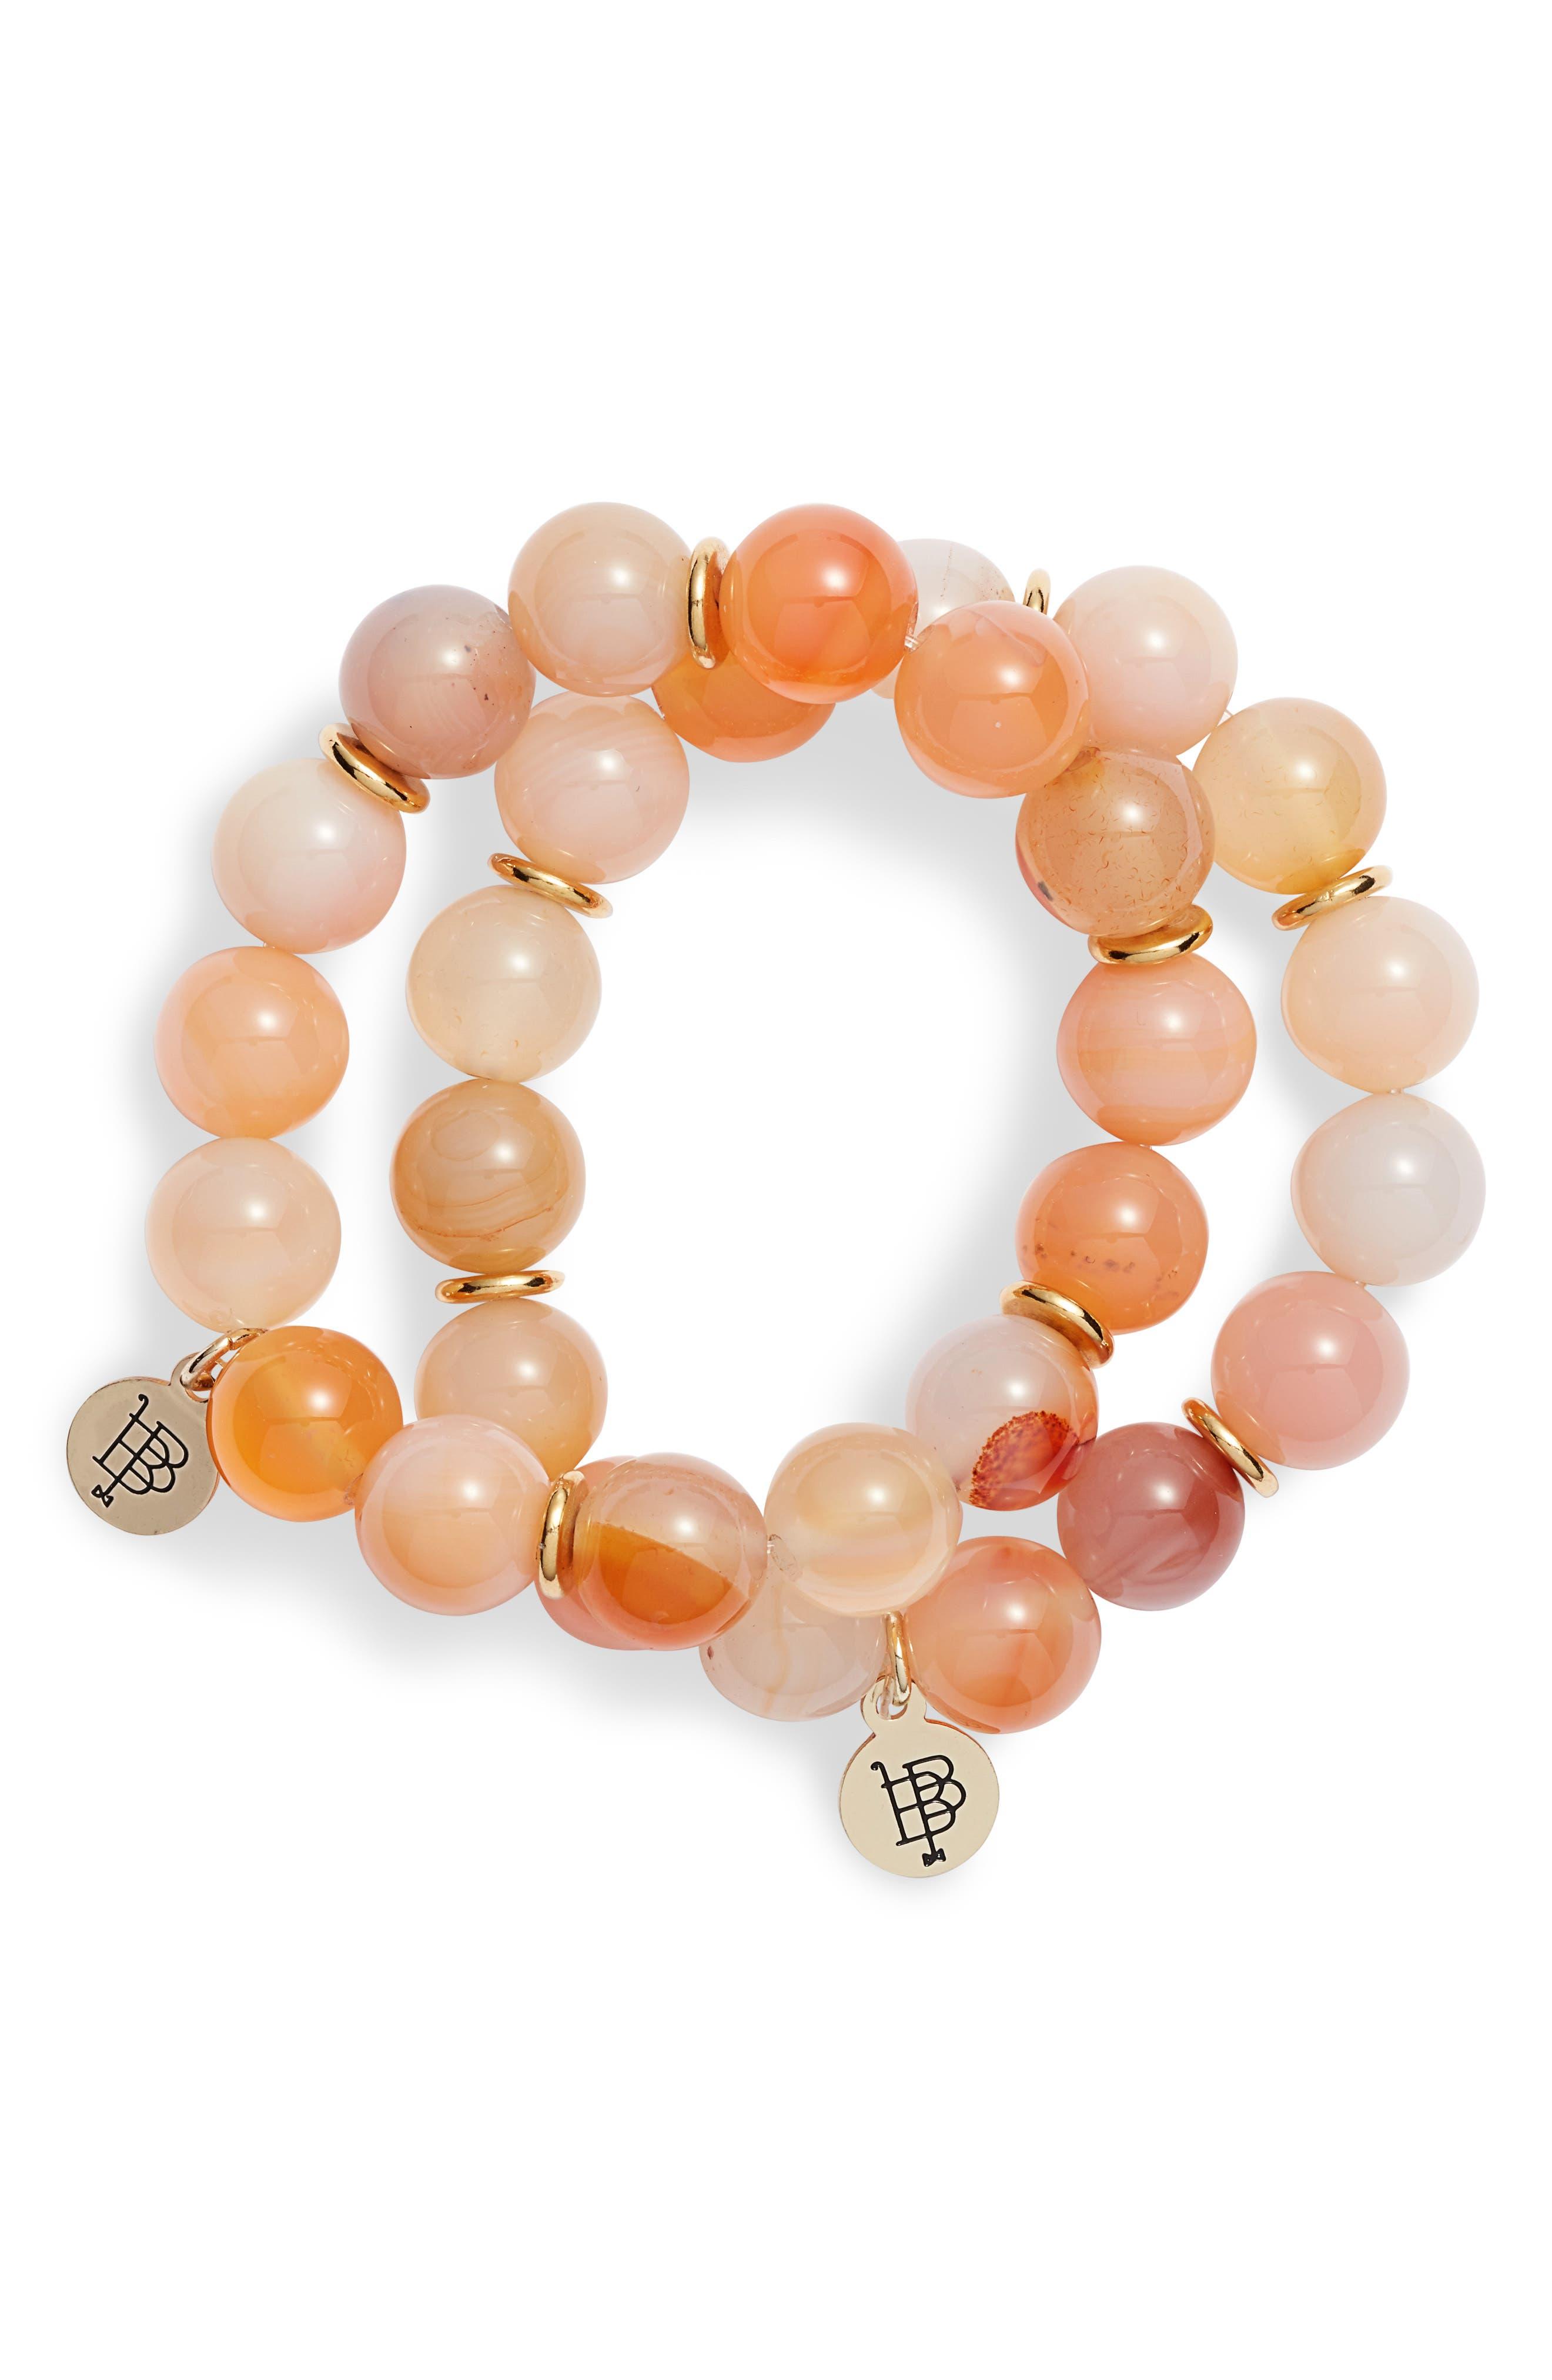 BOURBON AND BOWETIES, Set of 2 Stone Beaded Stretch Bracelets, Main thumbnail 1, color, ORANGE